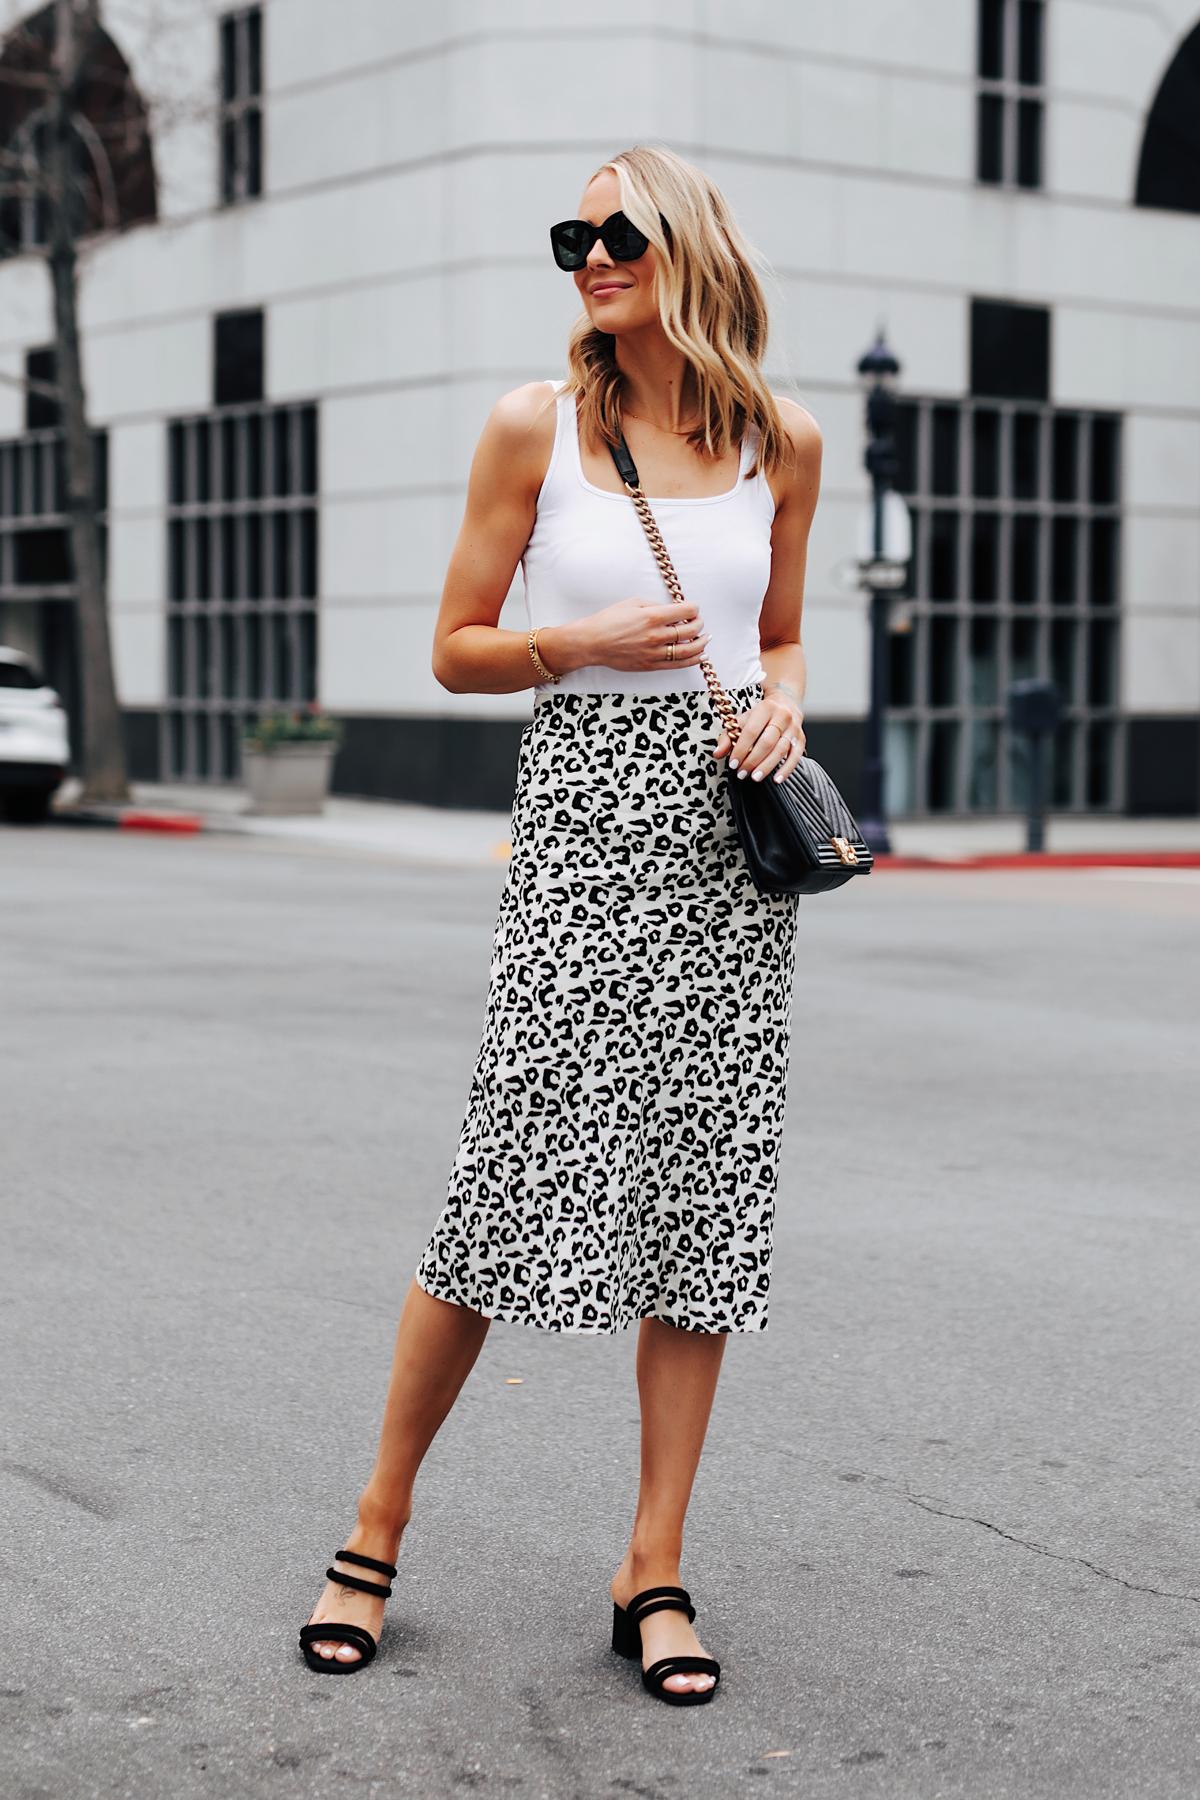 Fashion Jackson Wearing White Tank Leopard Midi Skrit Black Heeled Sandals Chanel Black Boy Bag